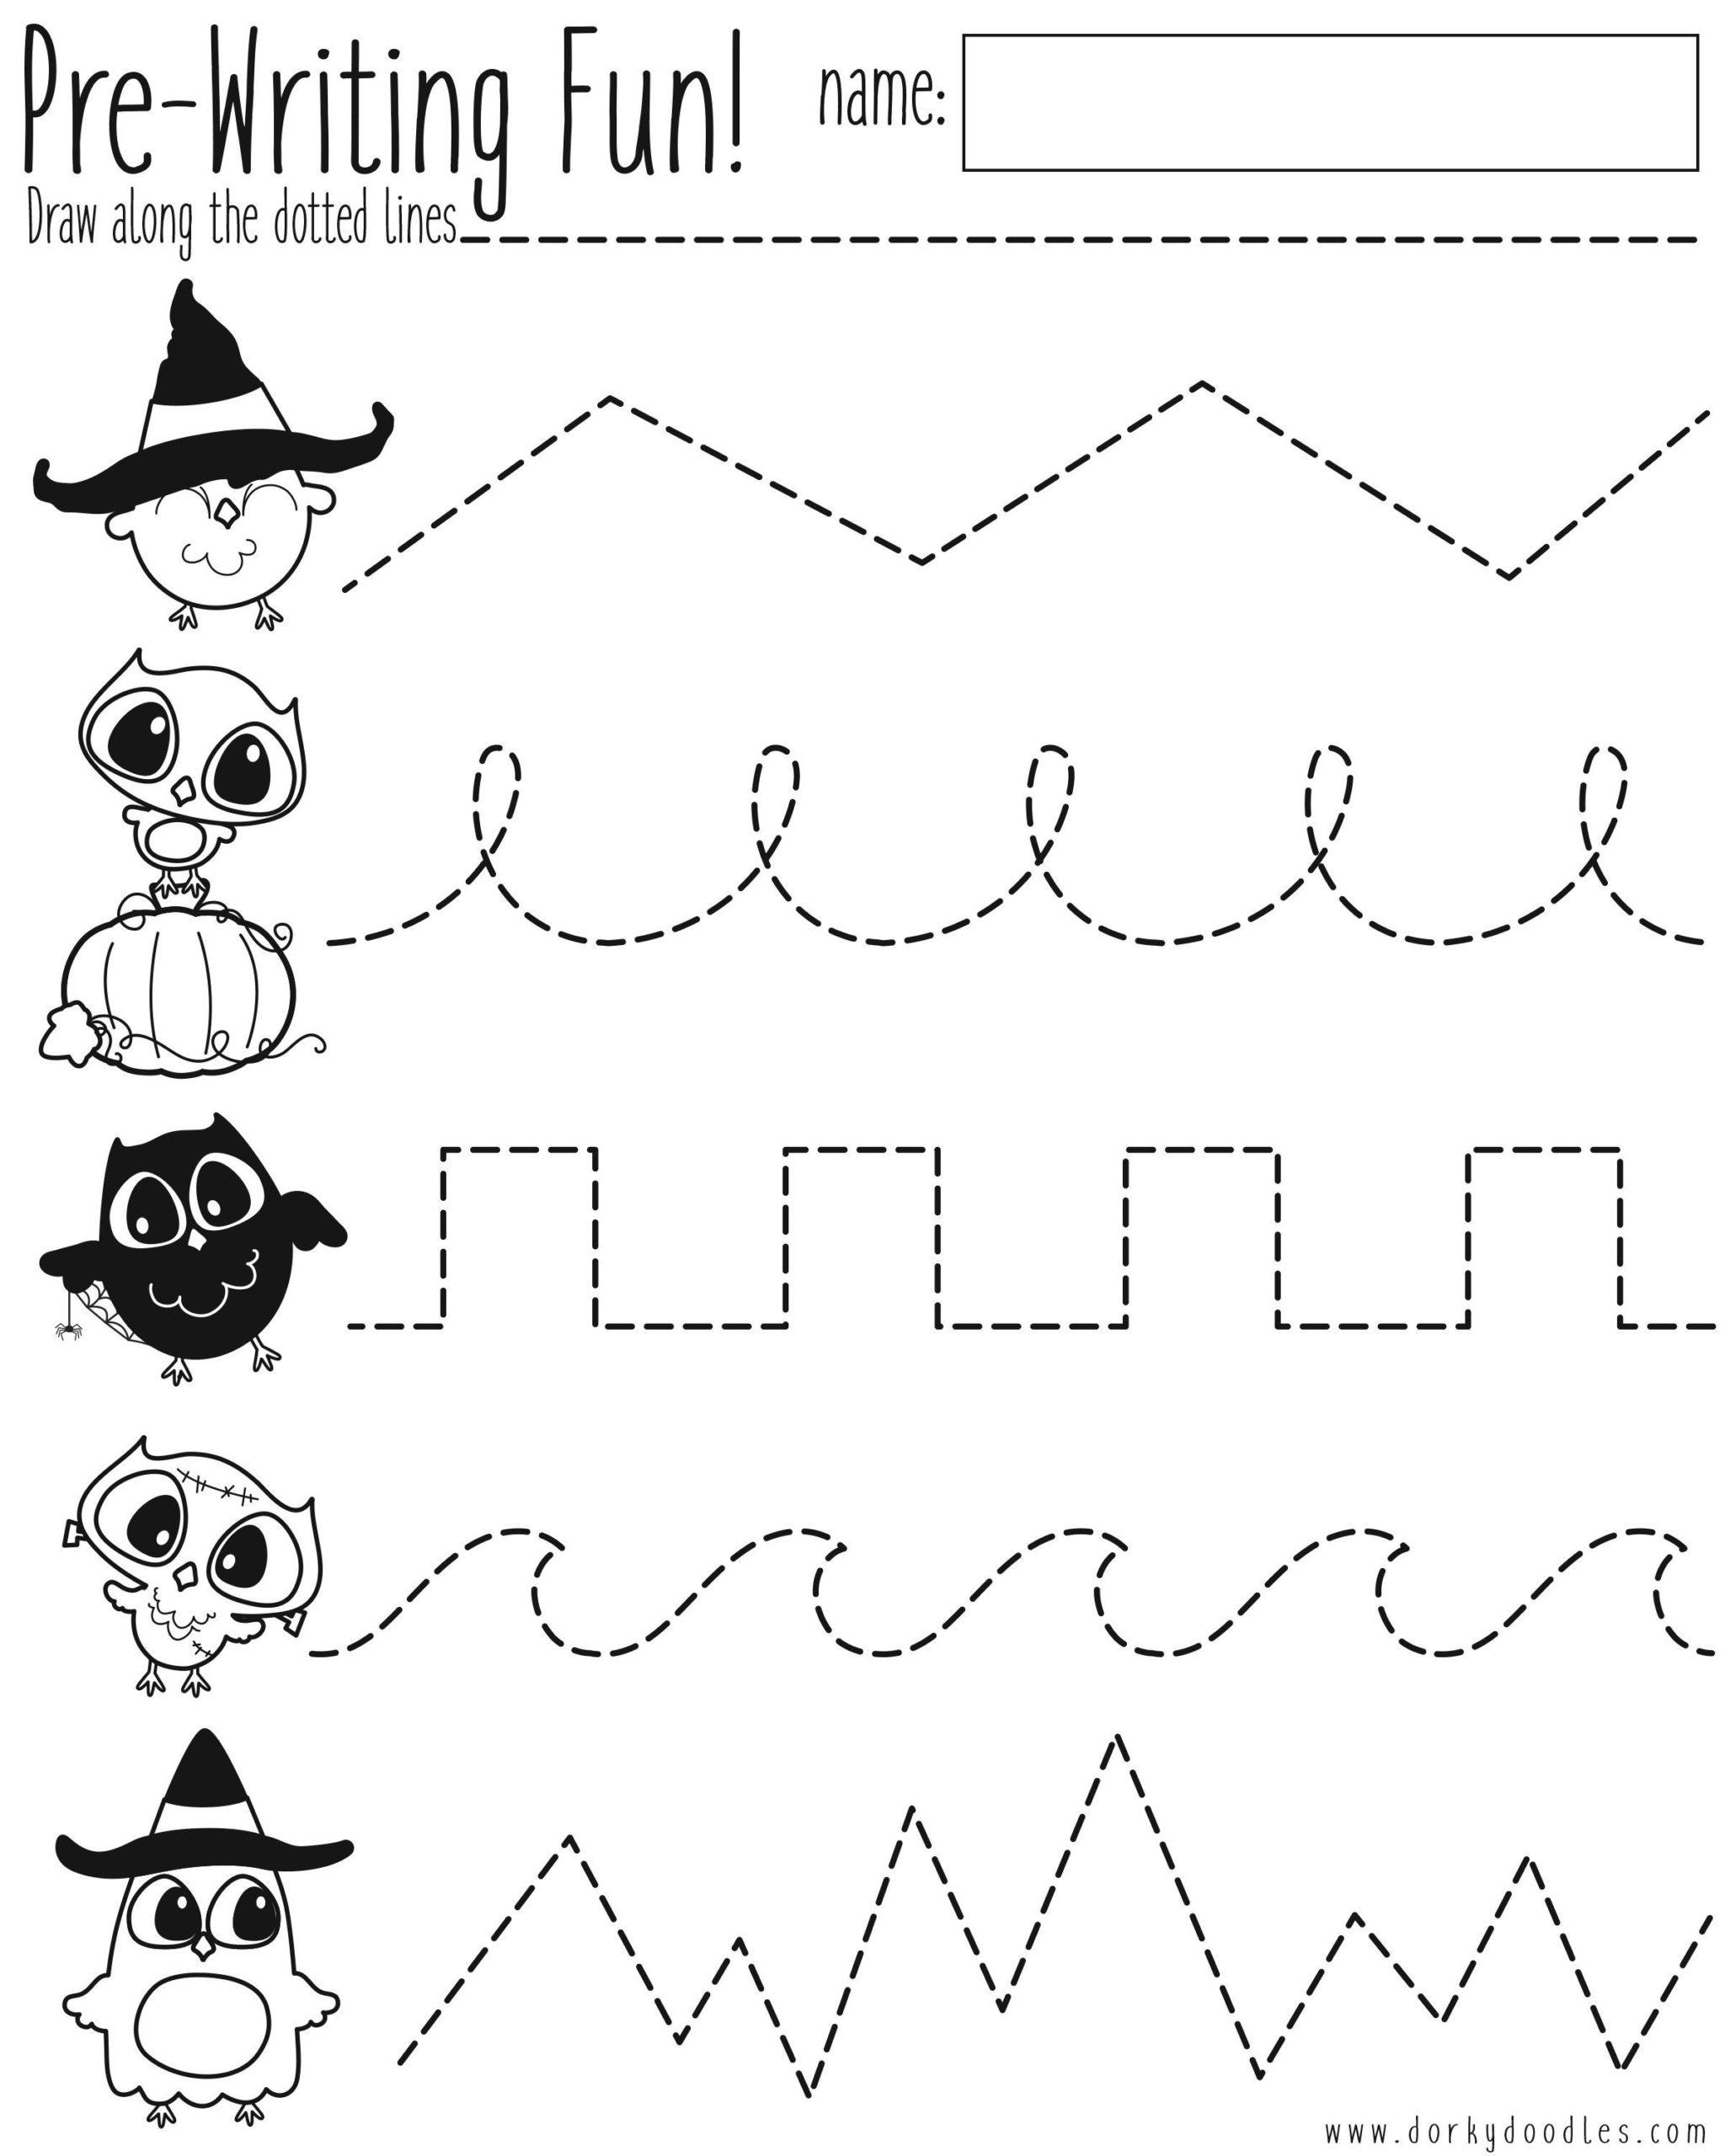 Pre-Writing Practice Halloween Worksheet – Dorky Doodles